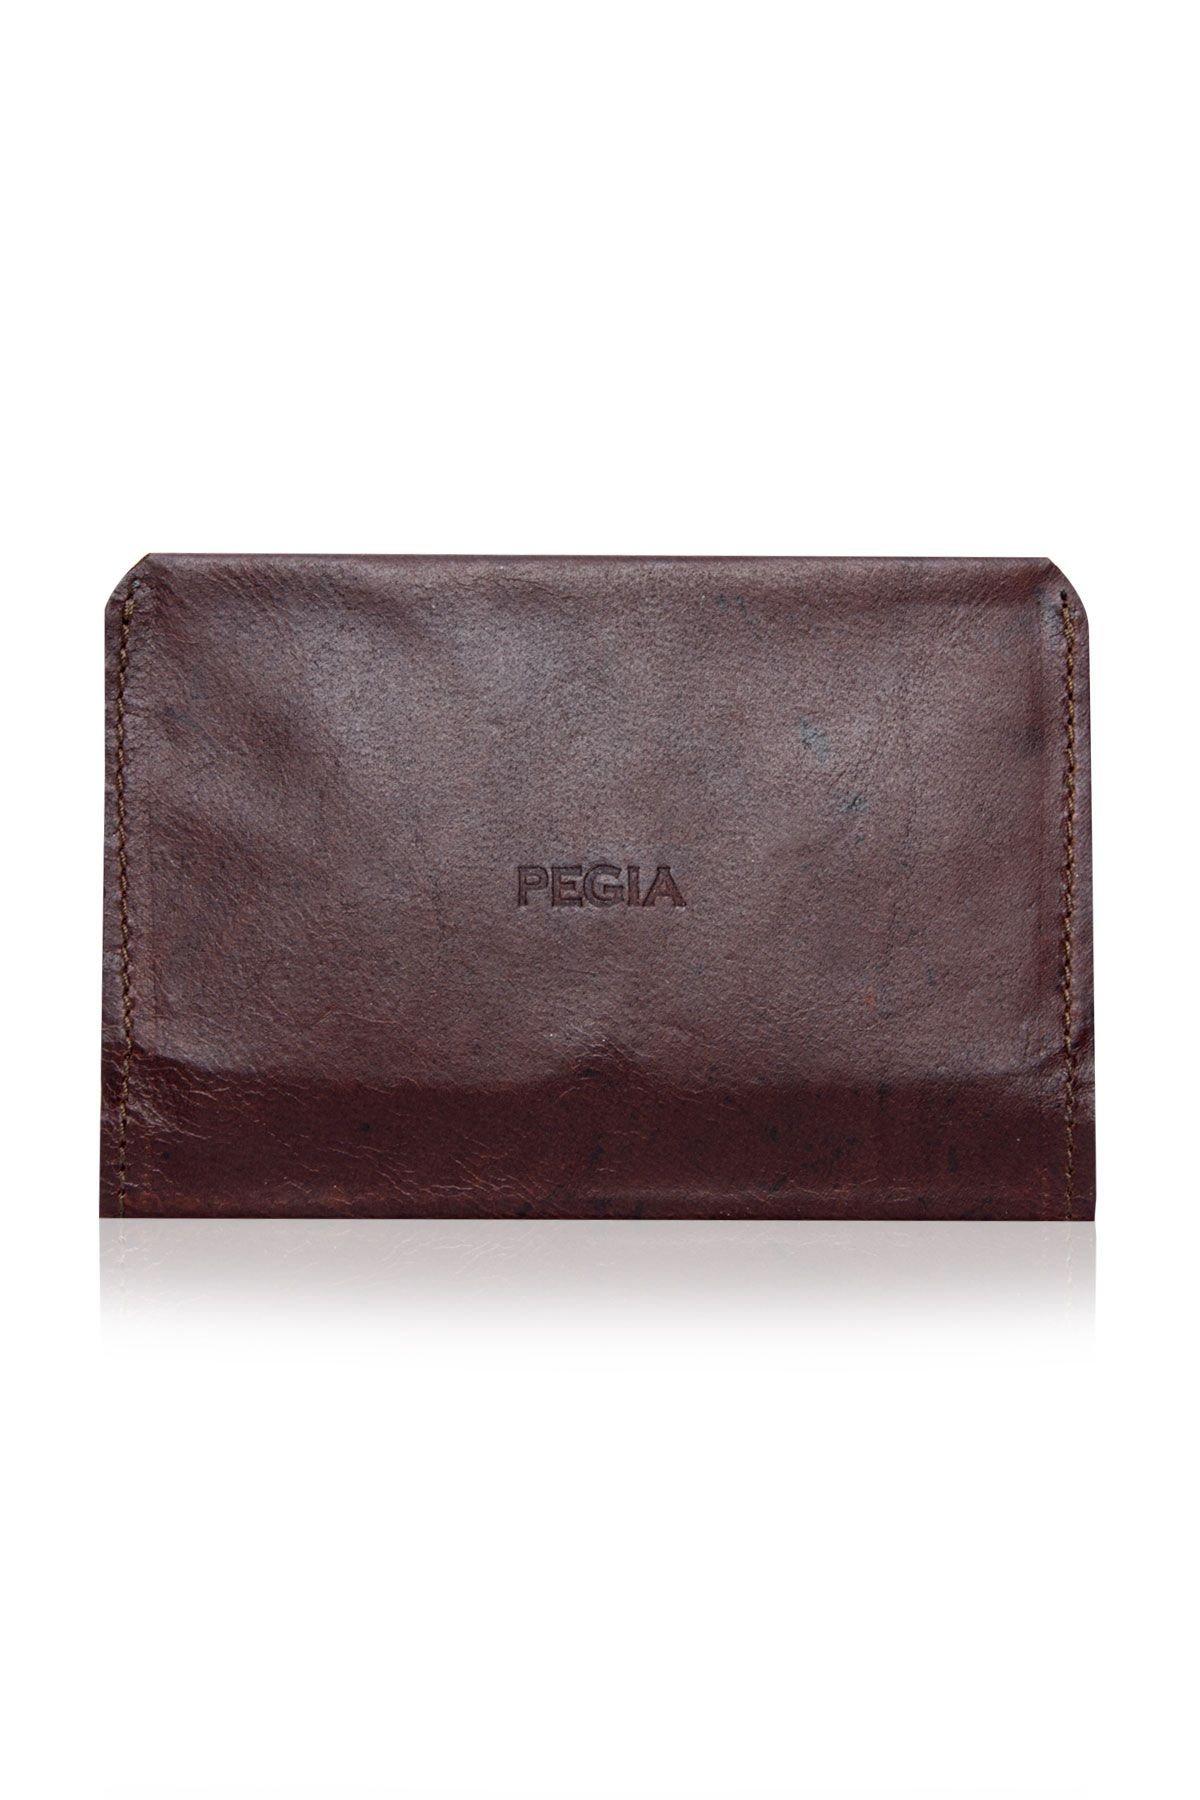 Pegia Genuine Leather Vintage Wallet  19CZ304 Brown